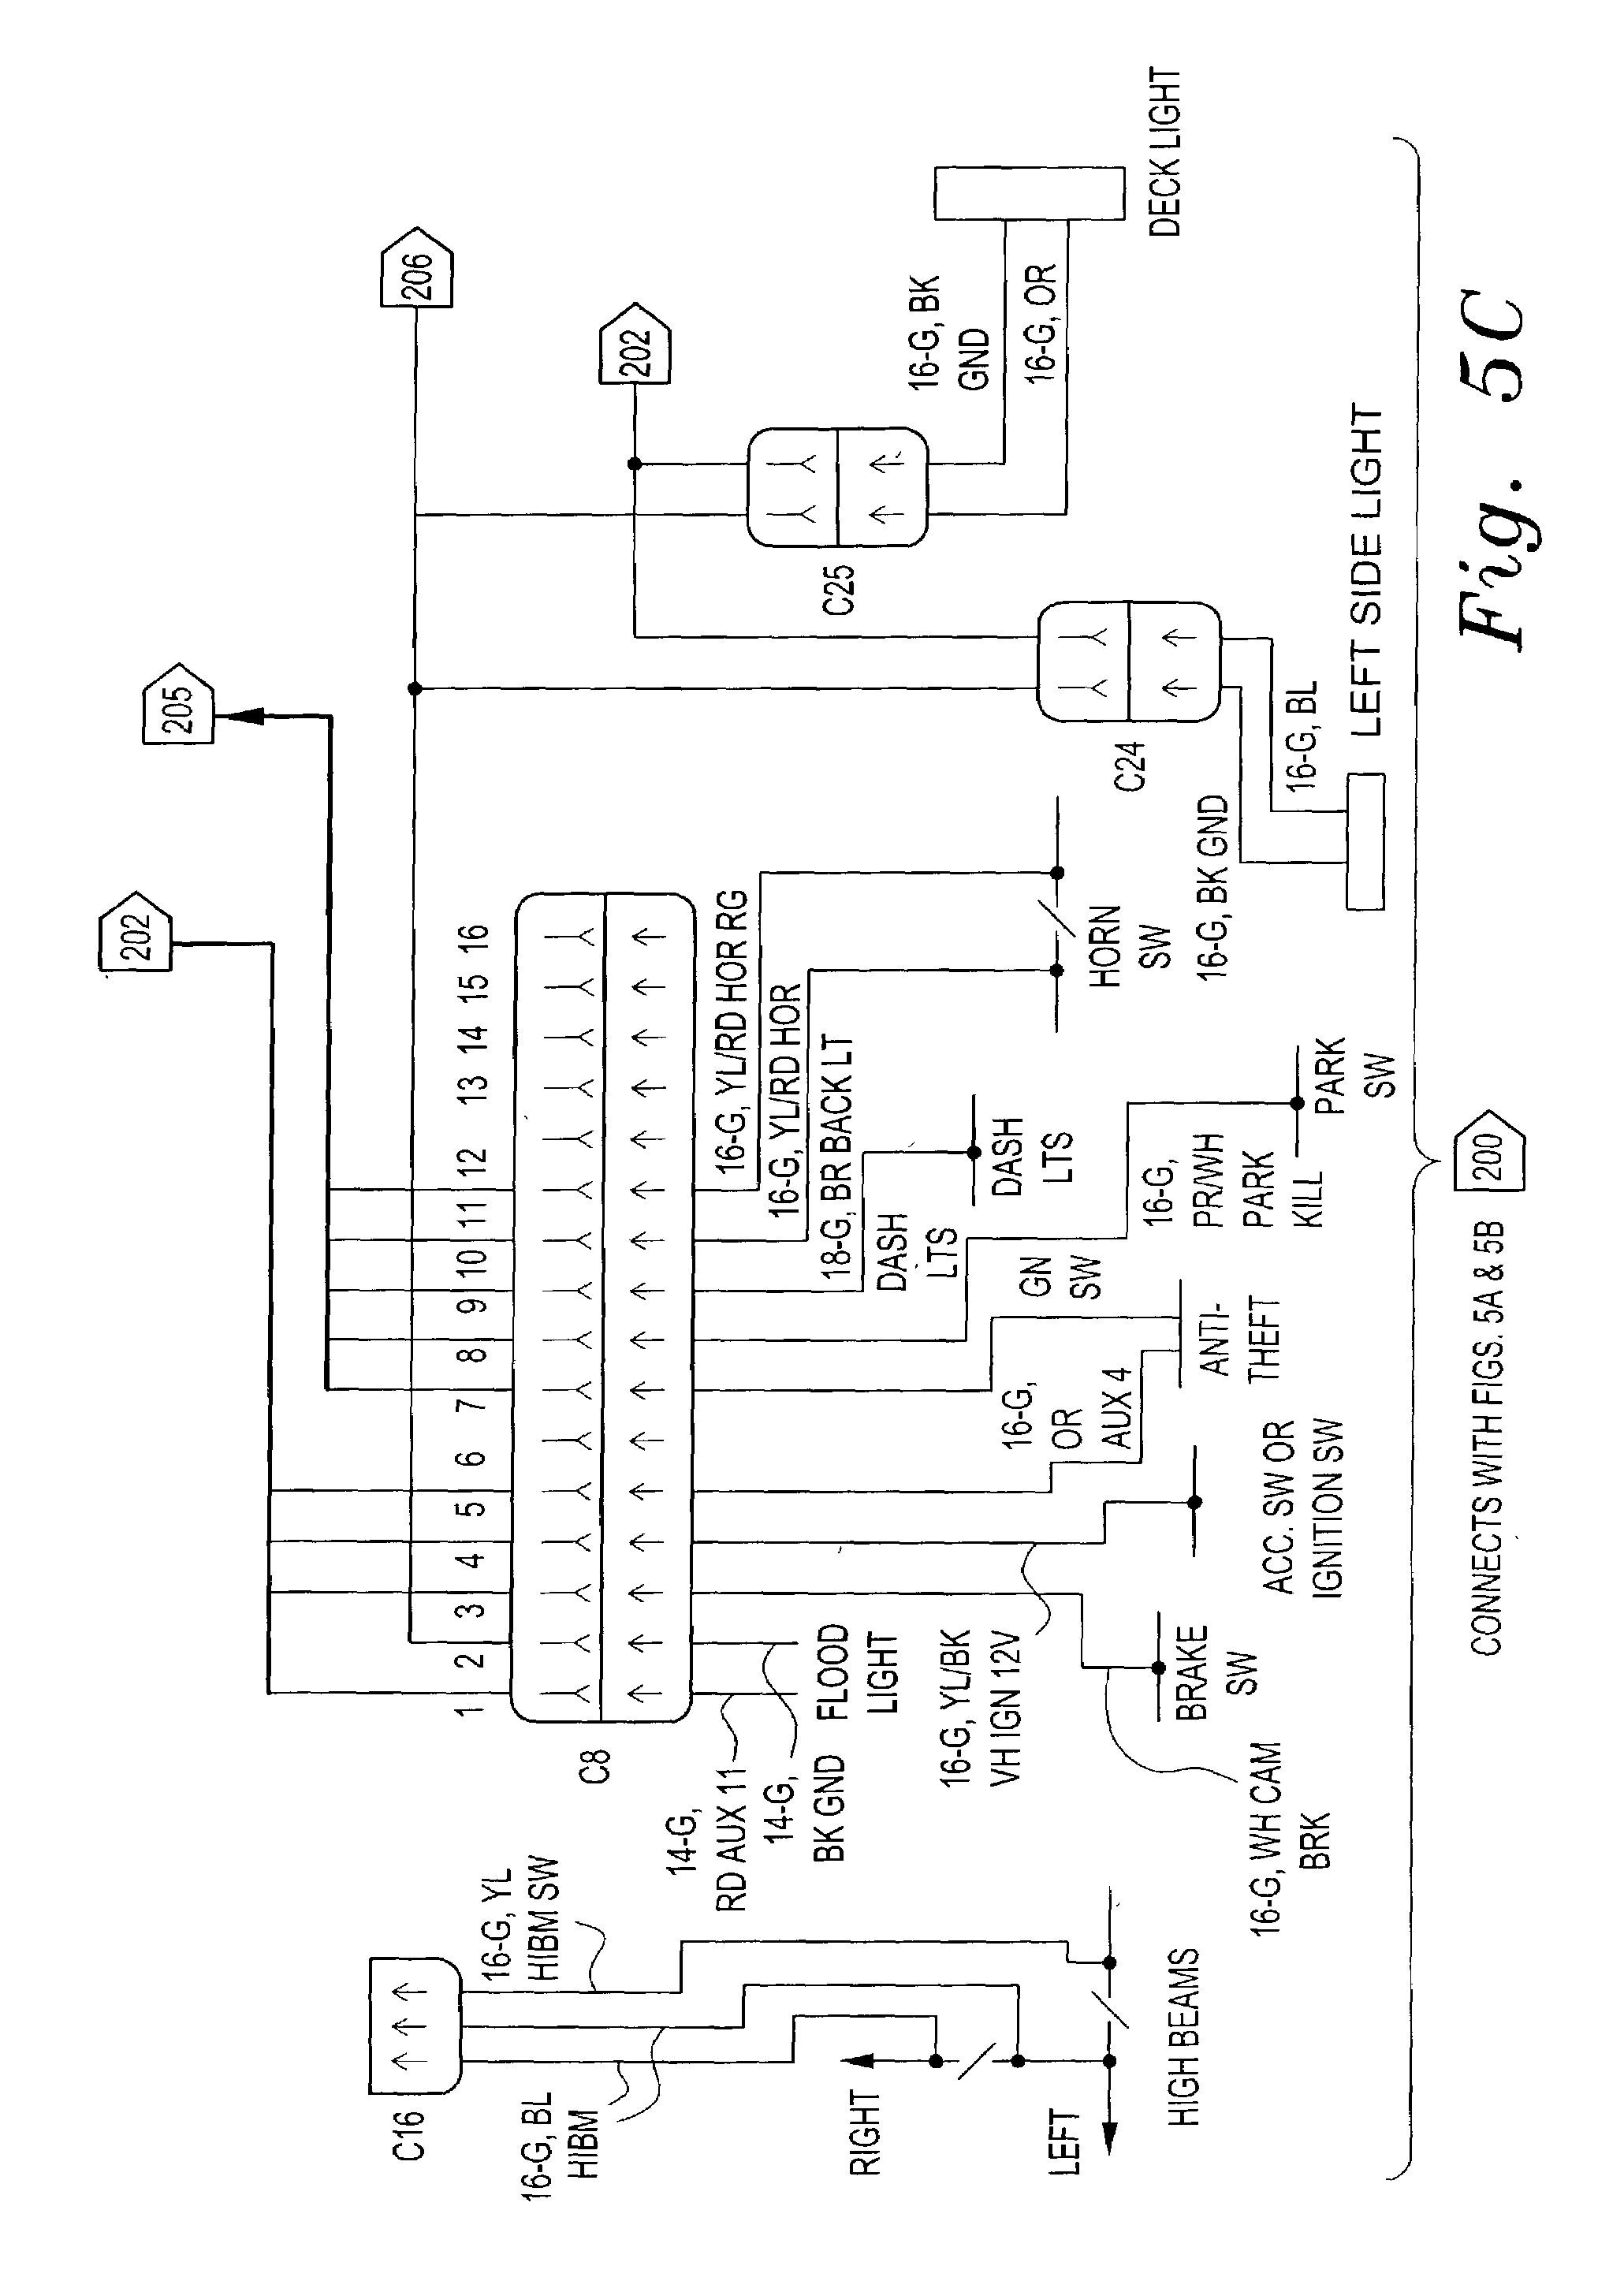 whelen control box wiring diagram Collection-Wiring Diagram for Whelen Edge 9000 Inspirationa Led Light Strip Wiring Diagram Katherinemarie 7-d